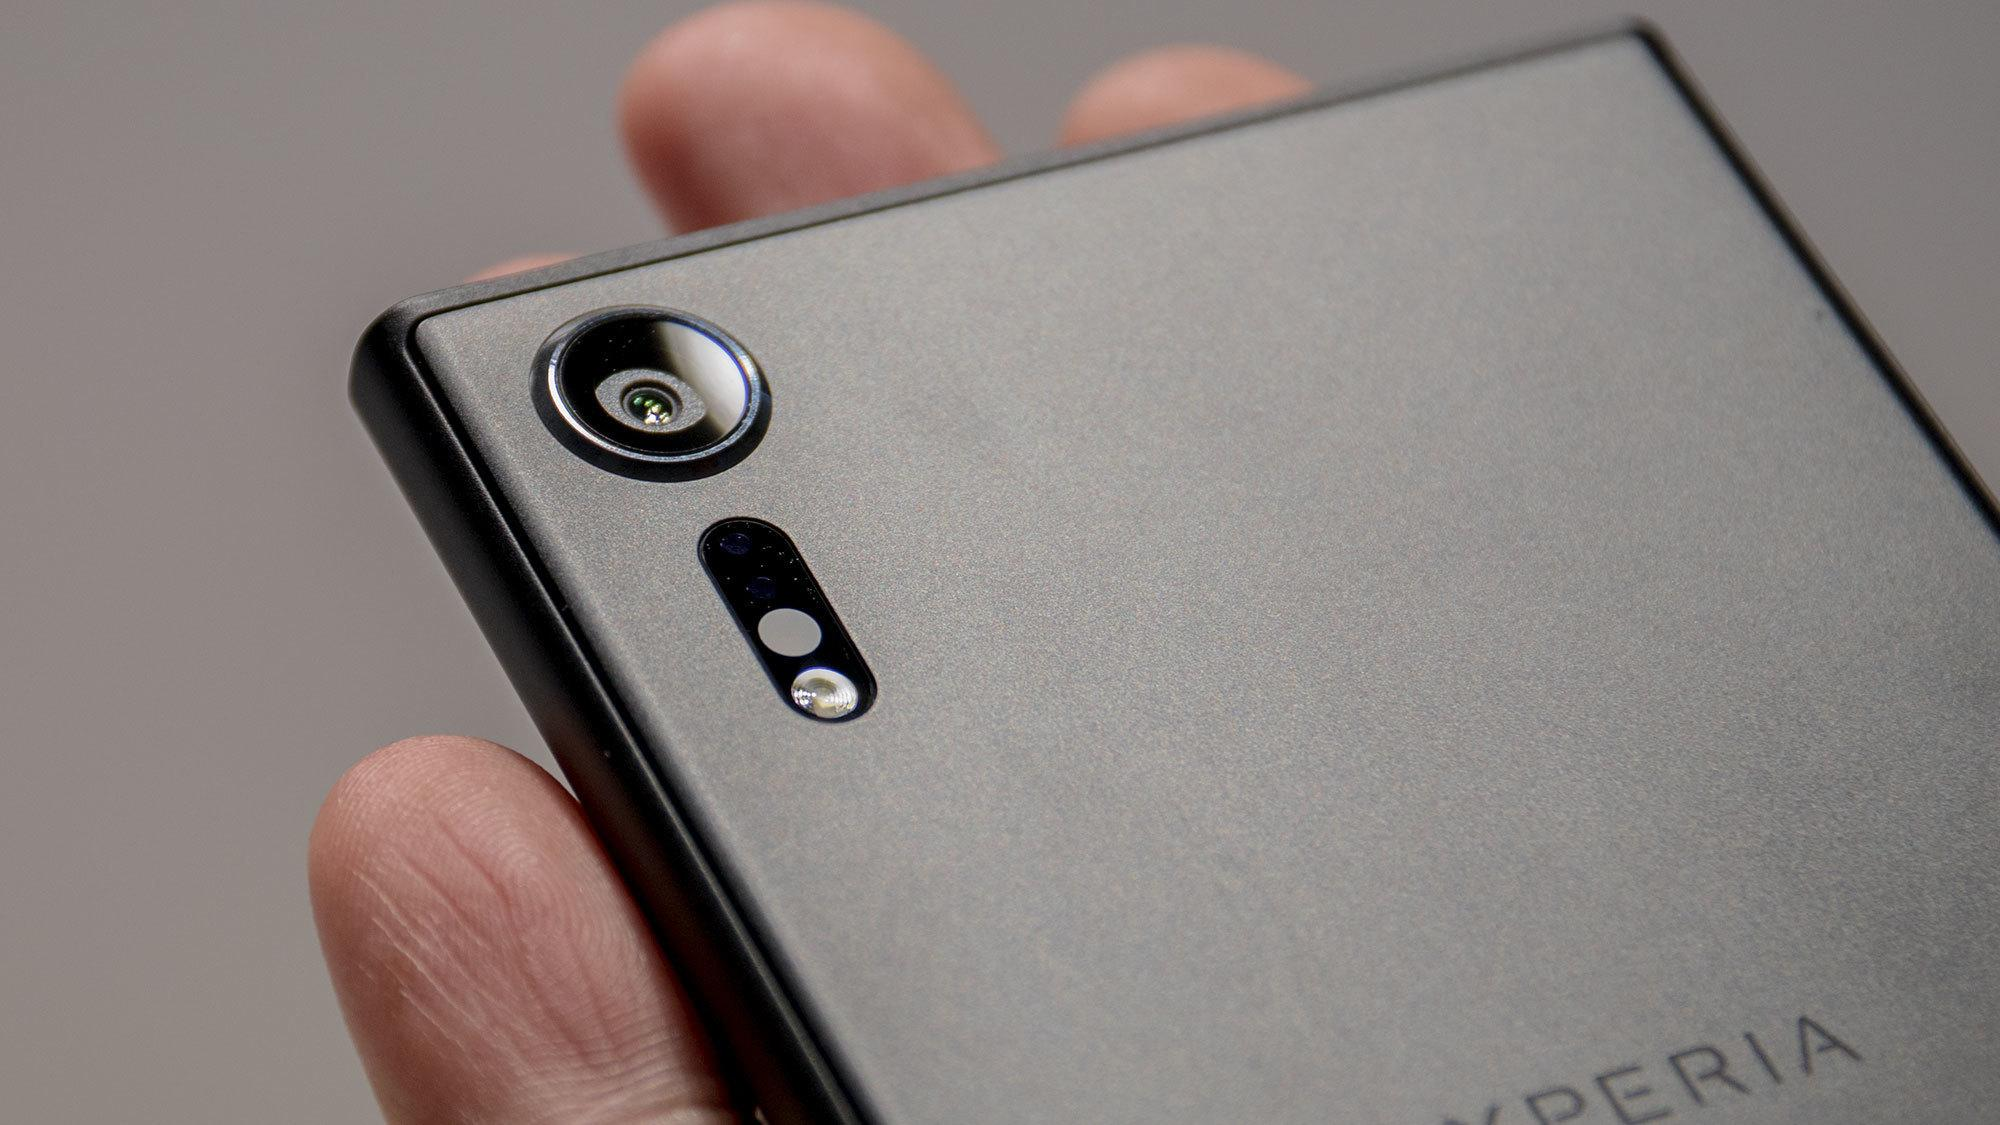 Slik ser Sonys Xperia XZ Premium ut.